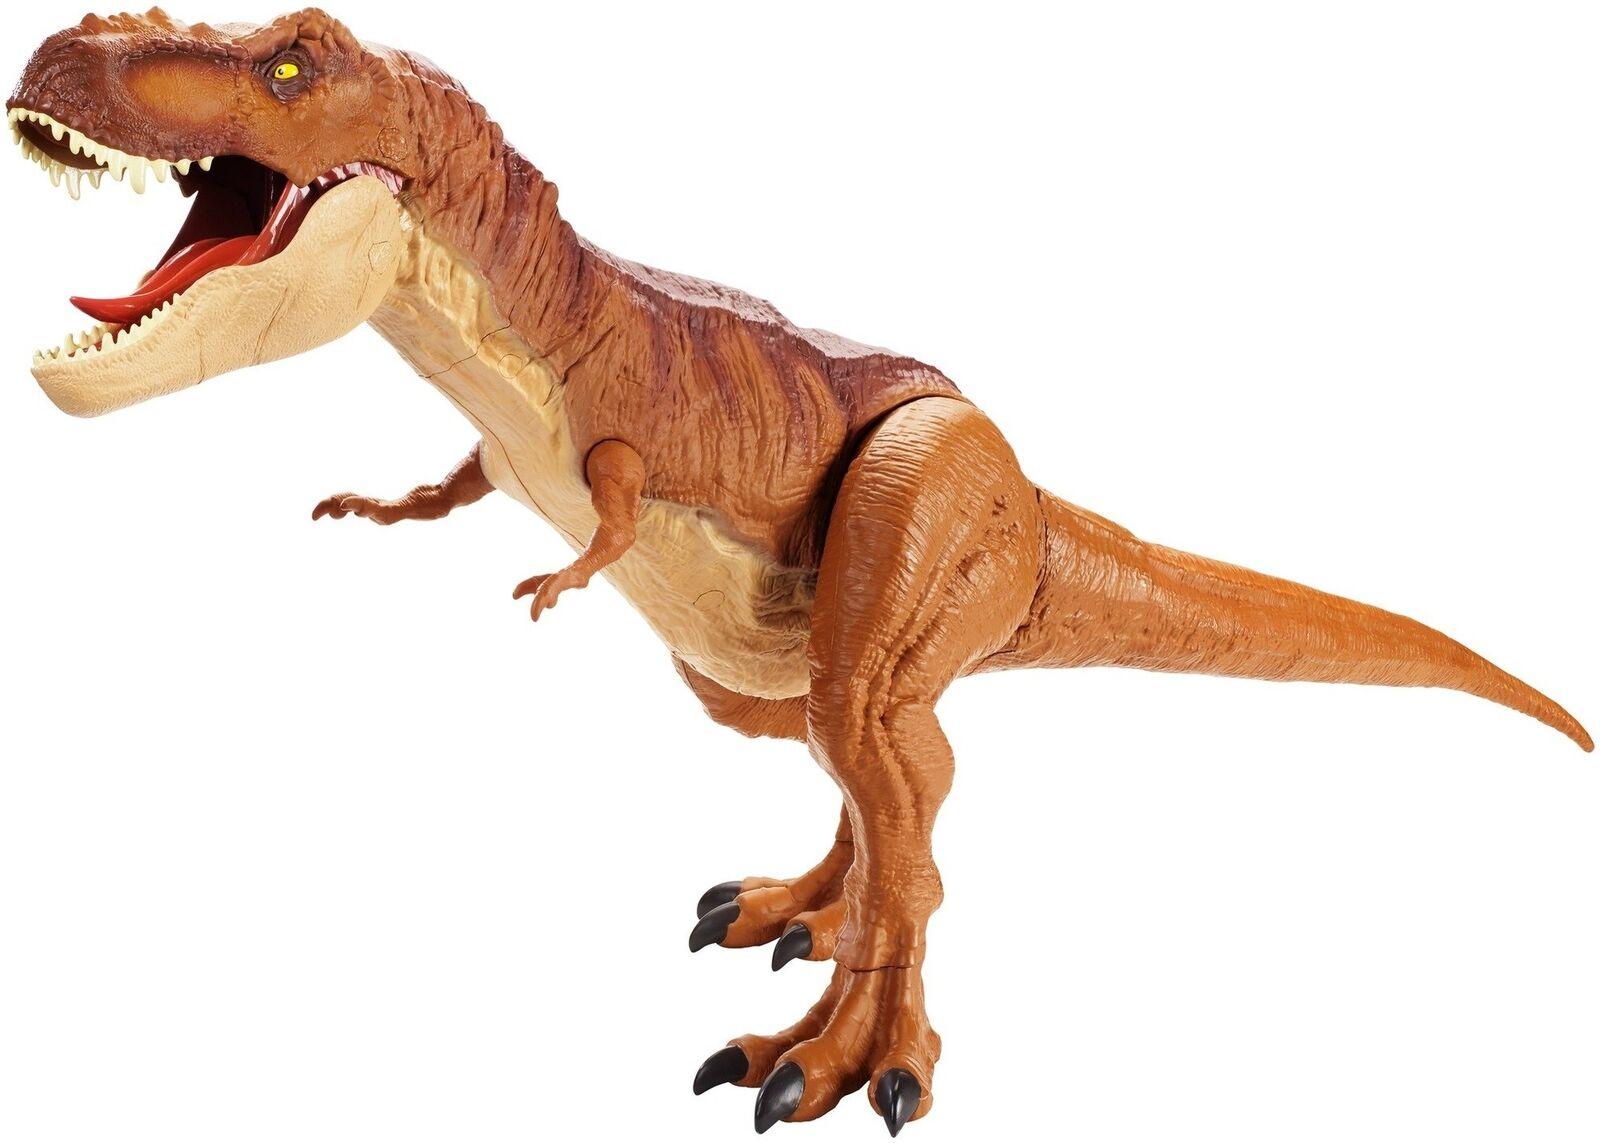 Jurassic World Super Colosal Tyrannosaurus Rex Dinosaur